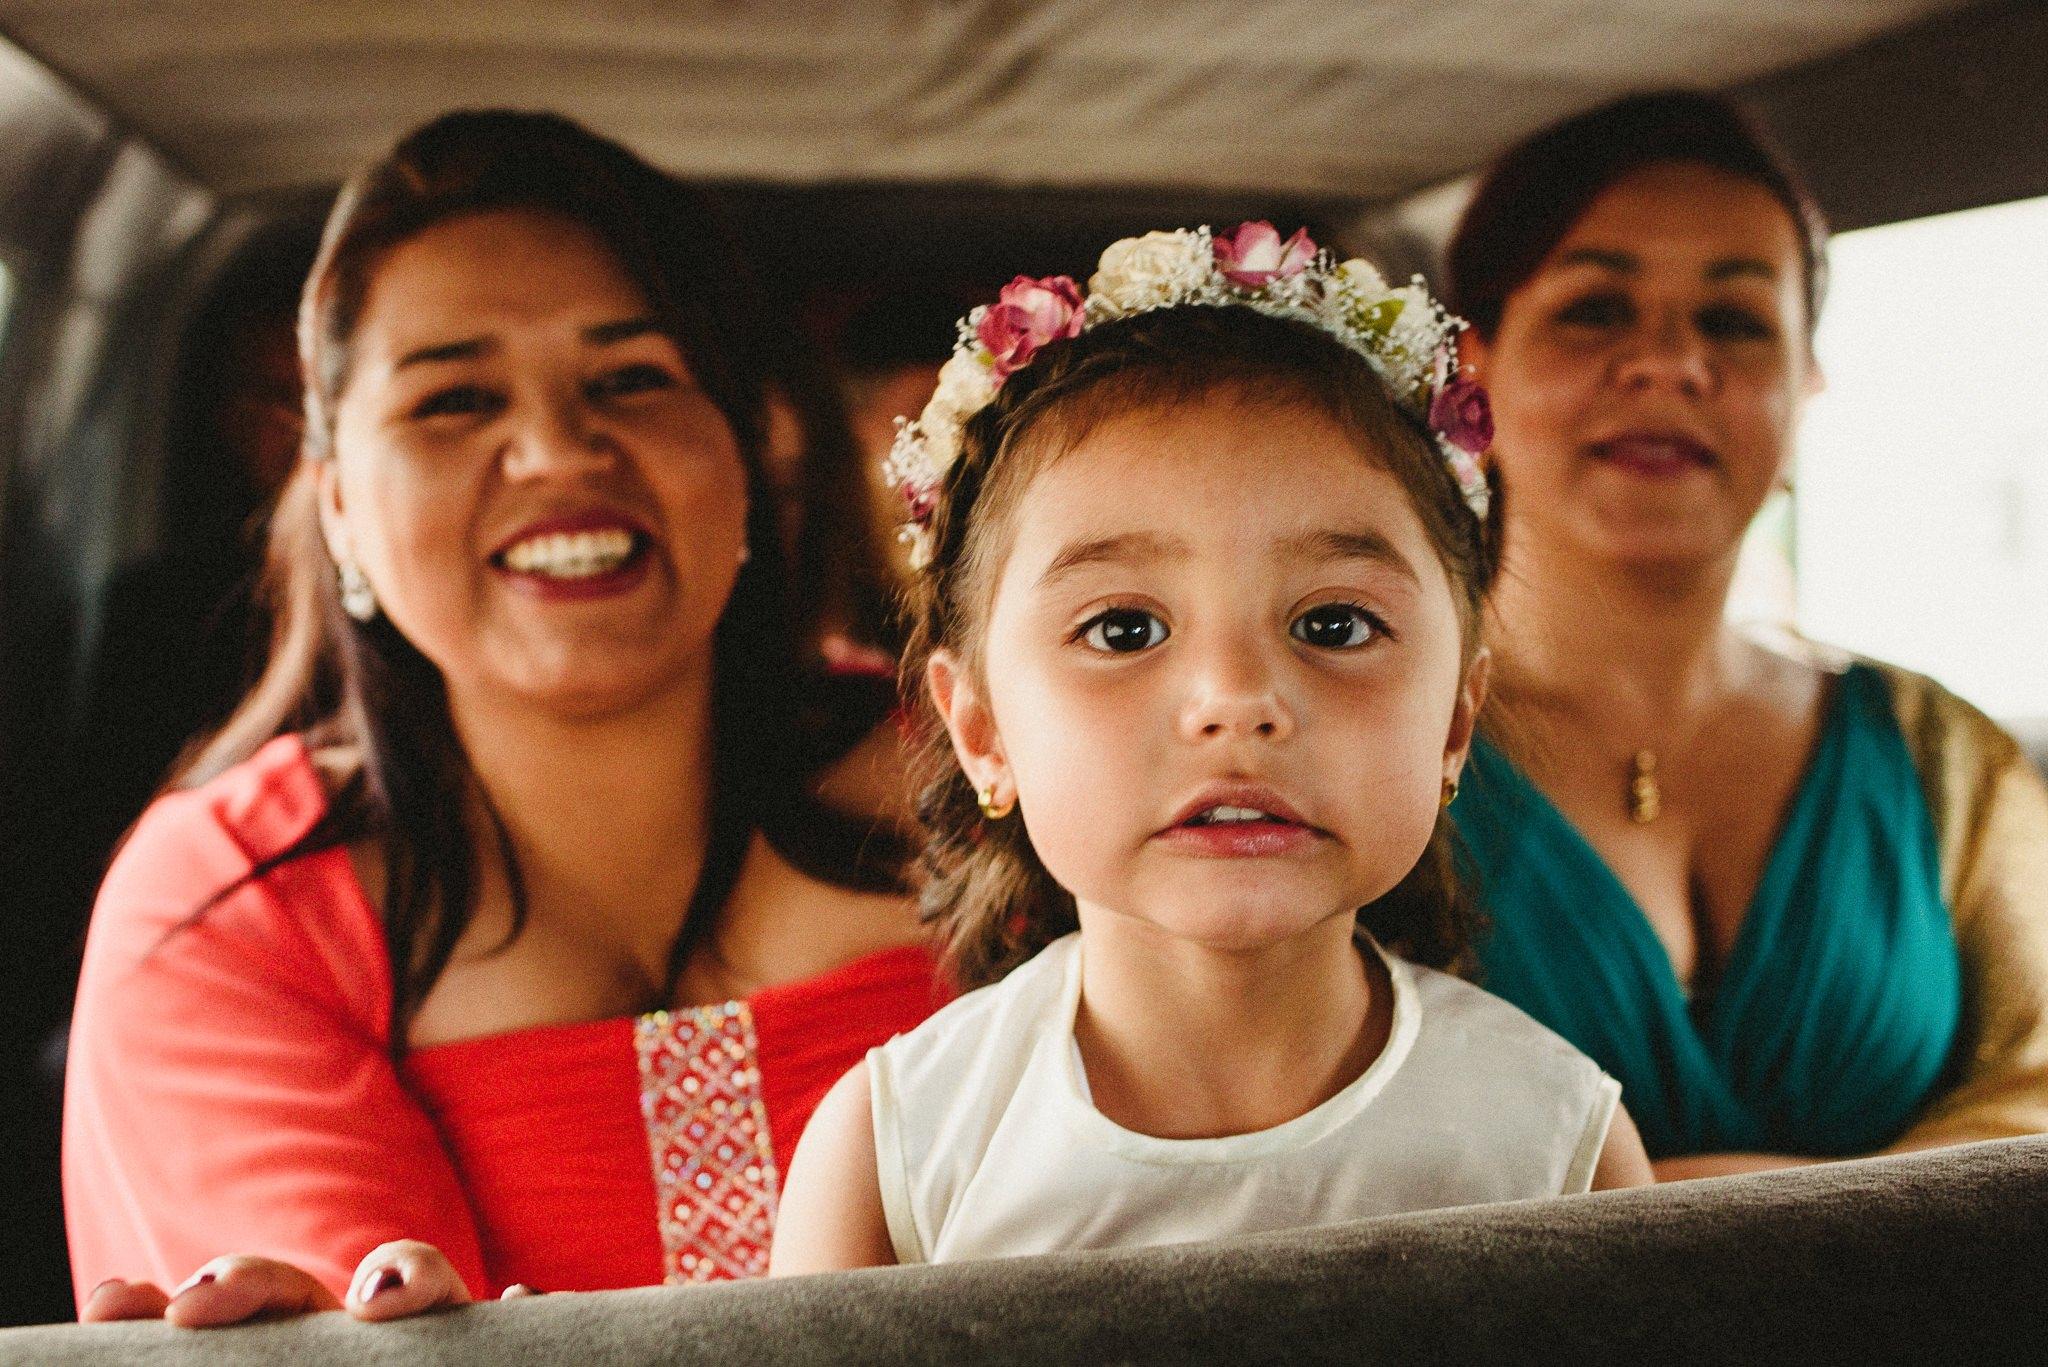 Wedding-Boda-Tulancingo-Hidalgo-Salon-Essenzia-Luis-Houdin-16-film